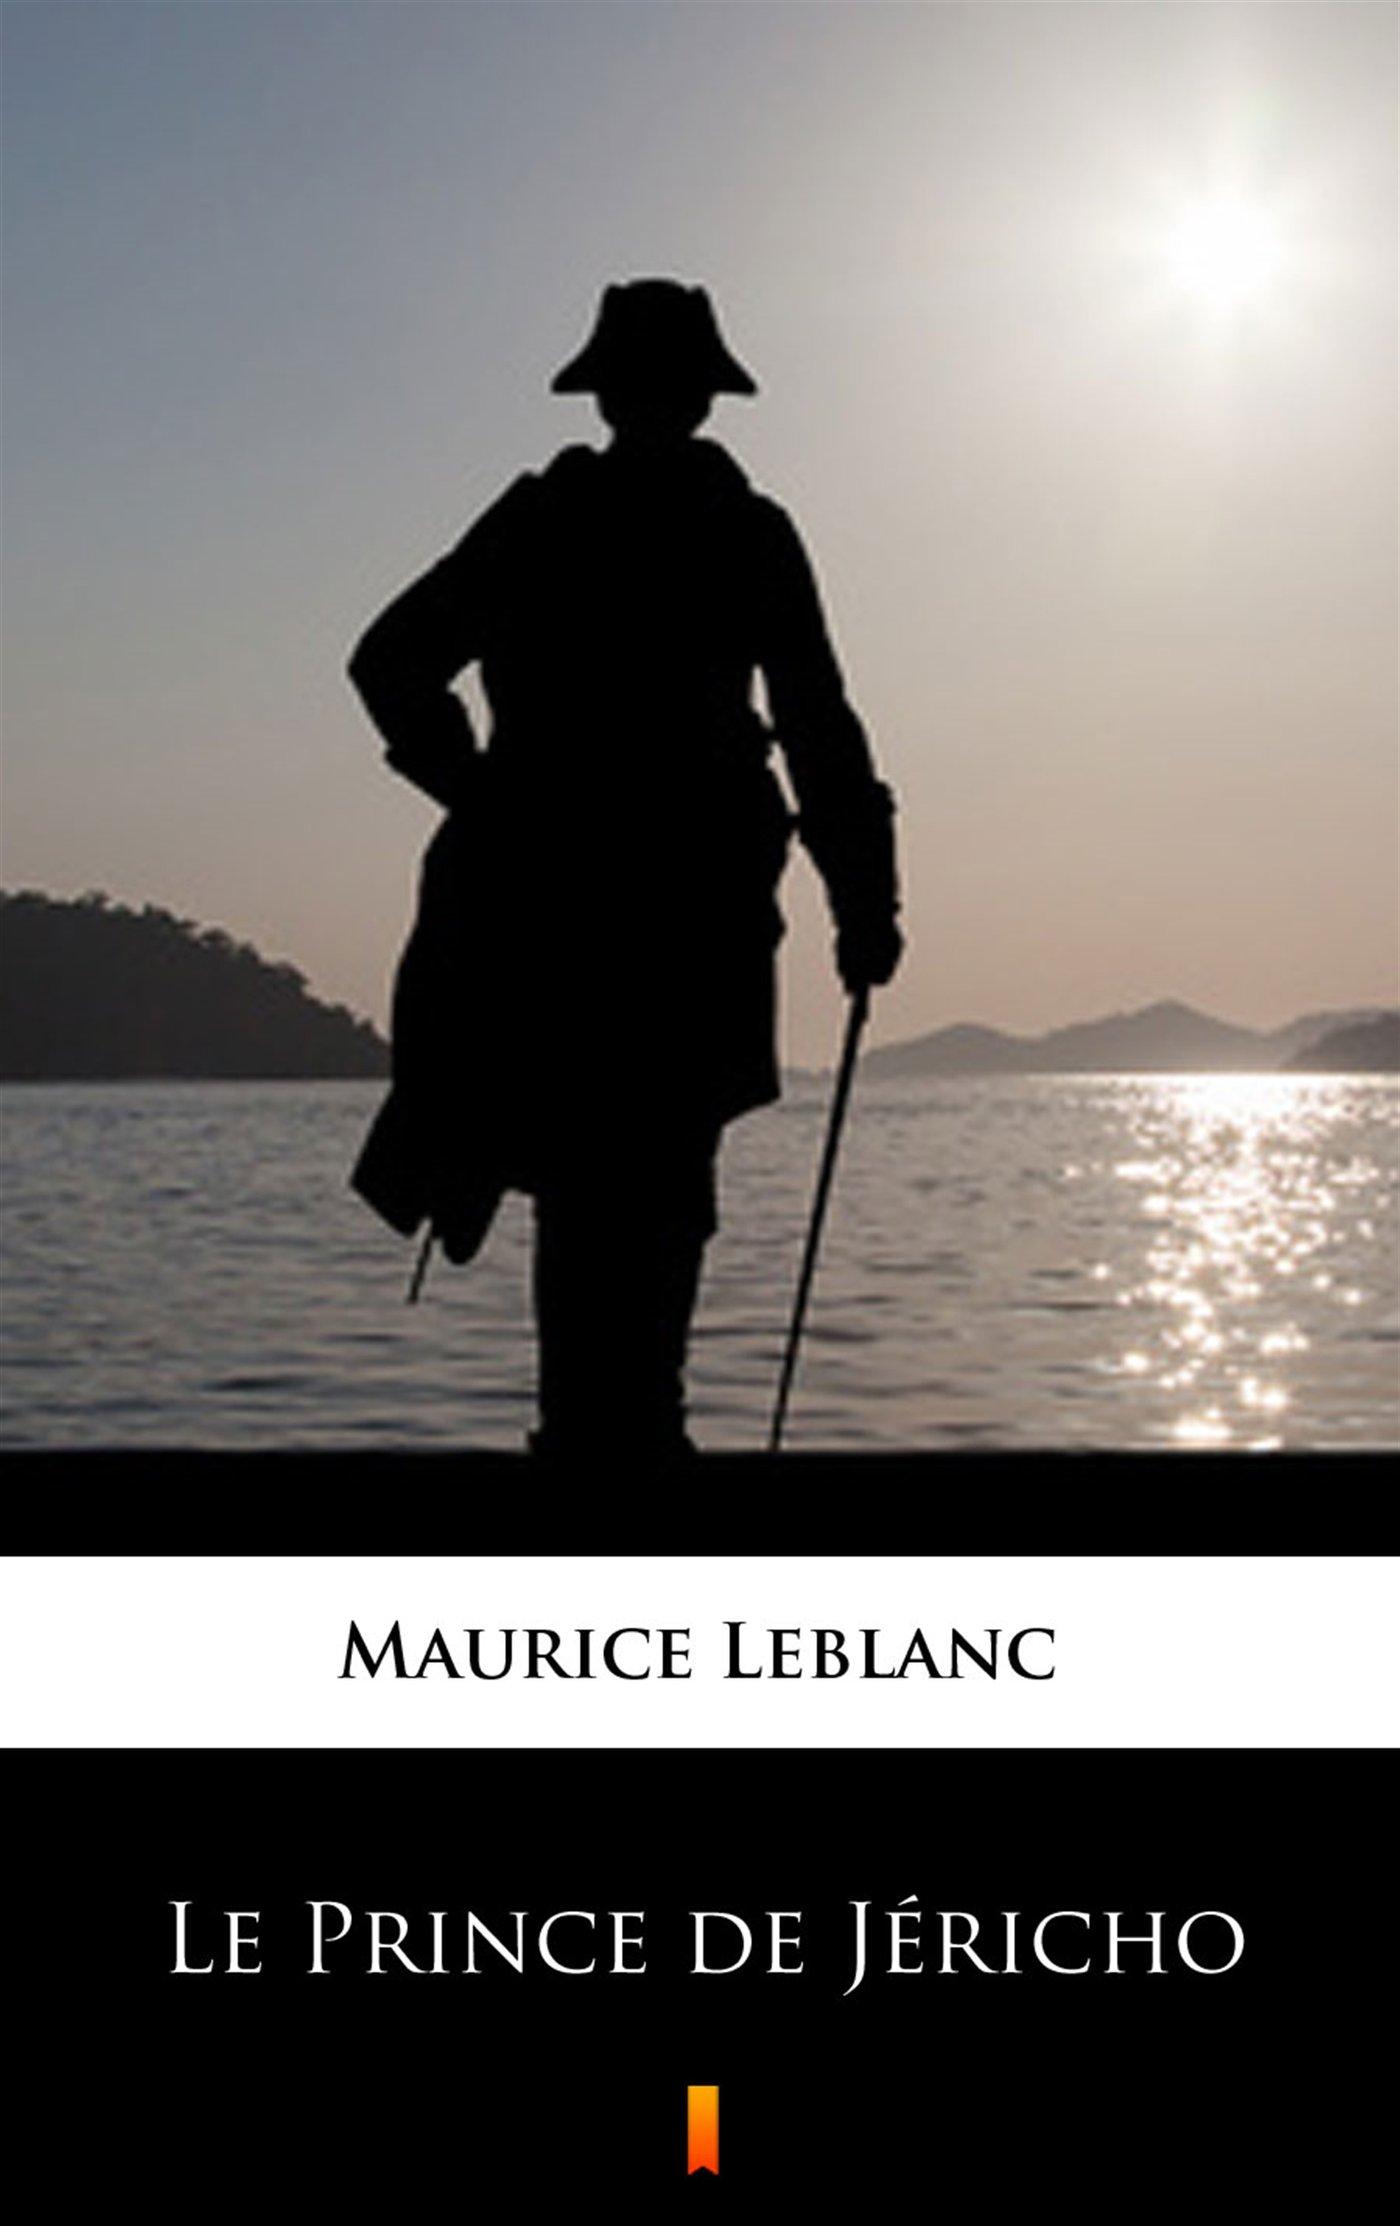 Le Prince de Jericho - Ebook (Książka na Kindle) do pobrania w formacie MOBI